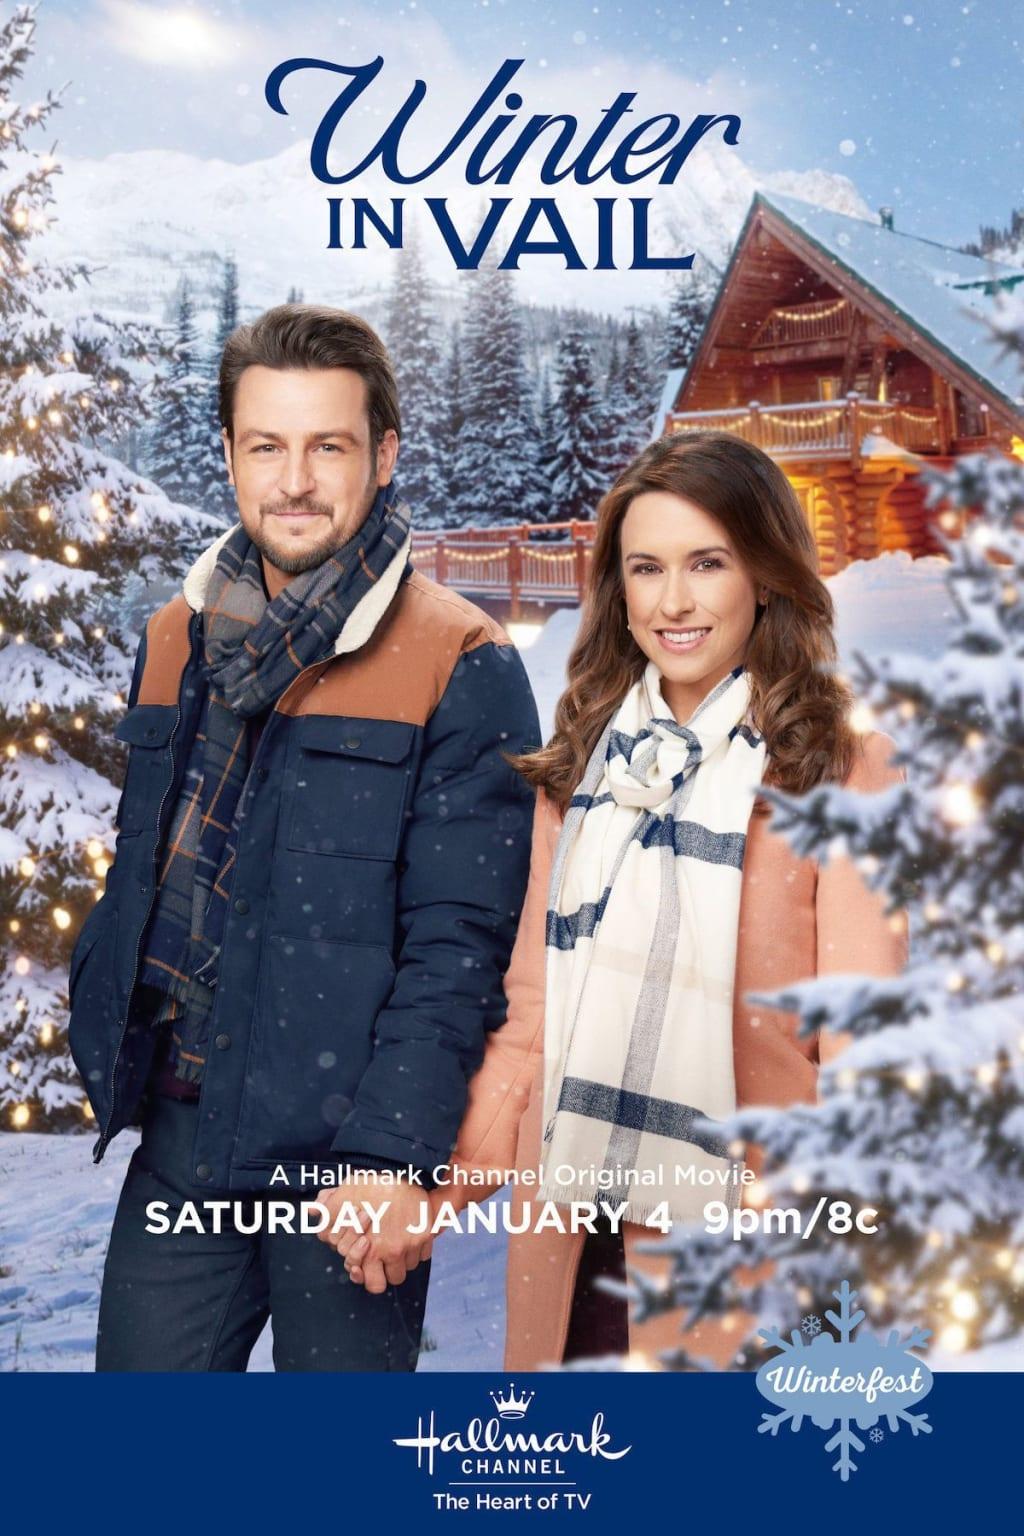 Hallmark Review: 'Winter in Vail'